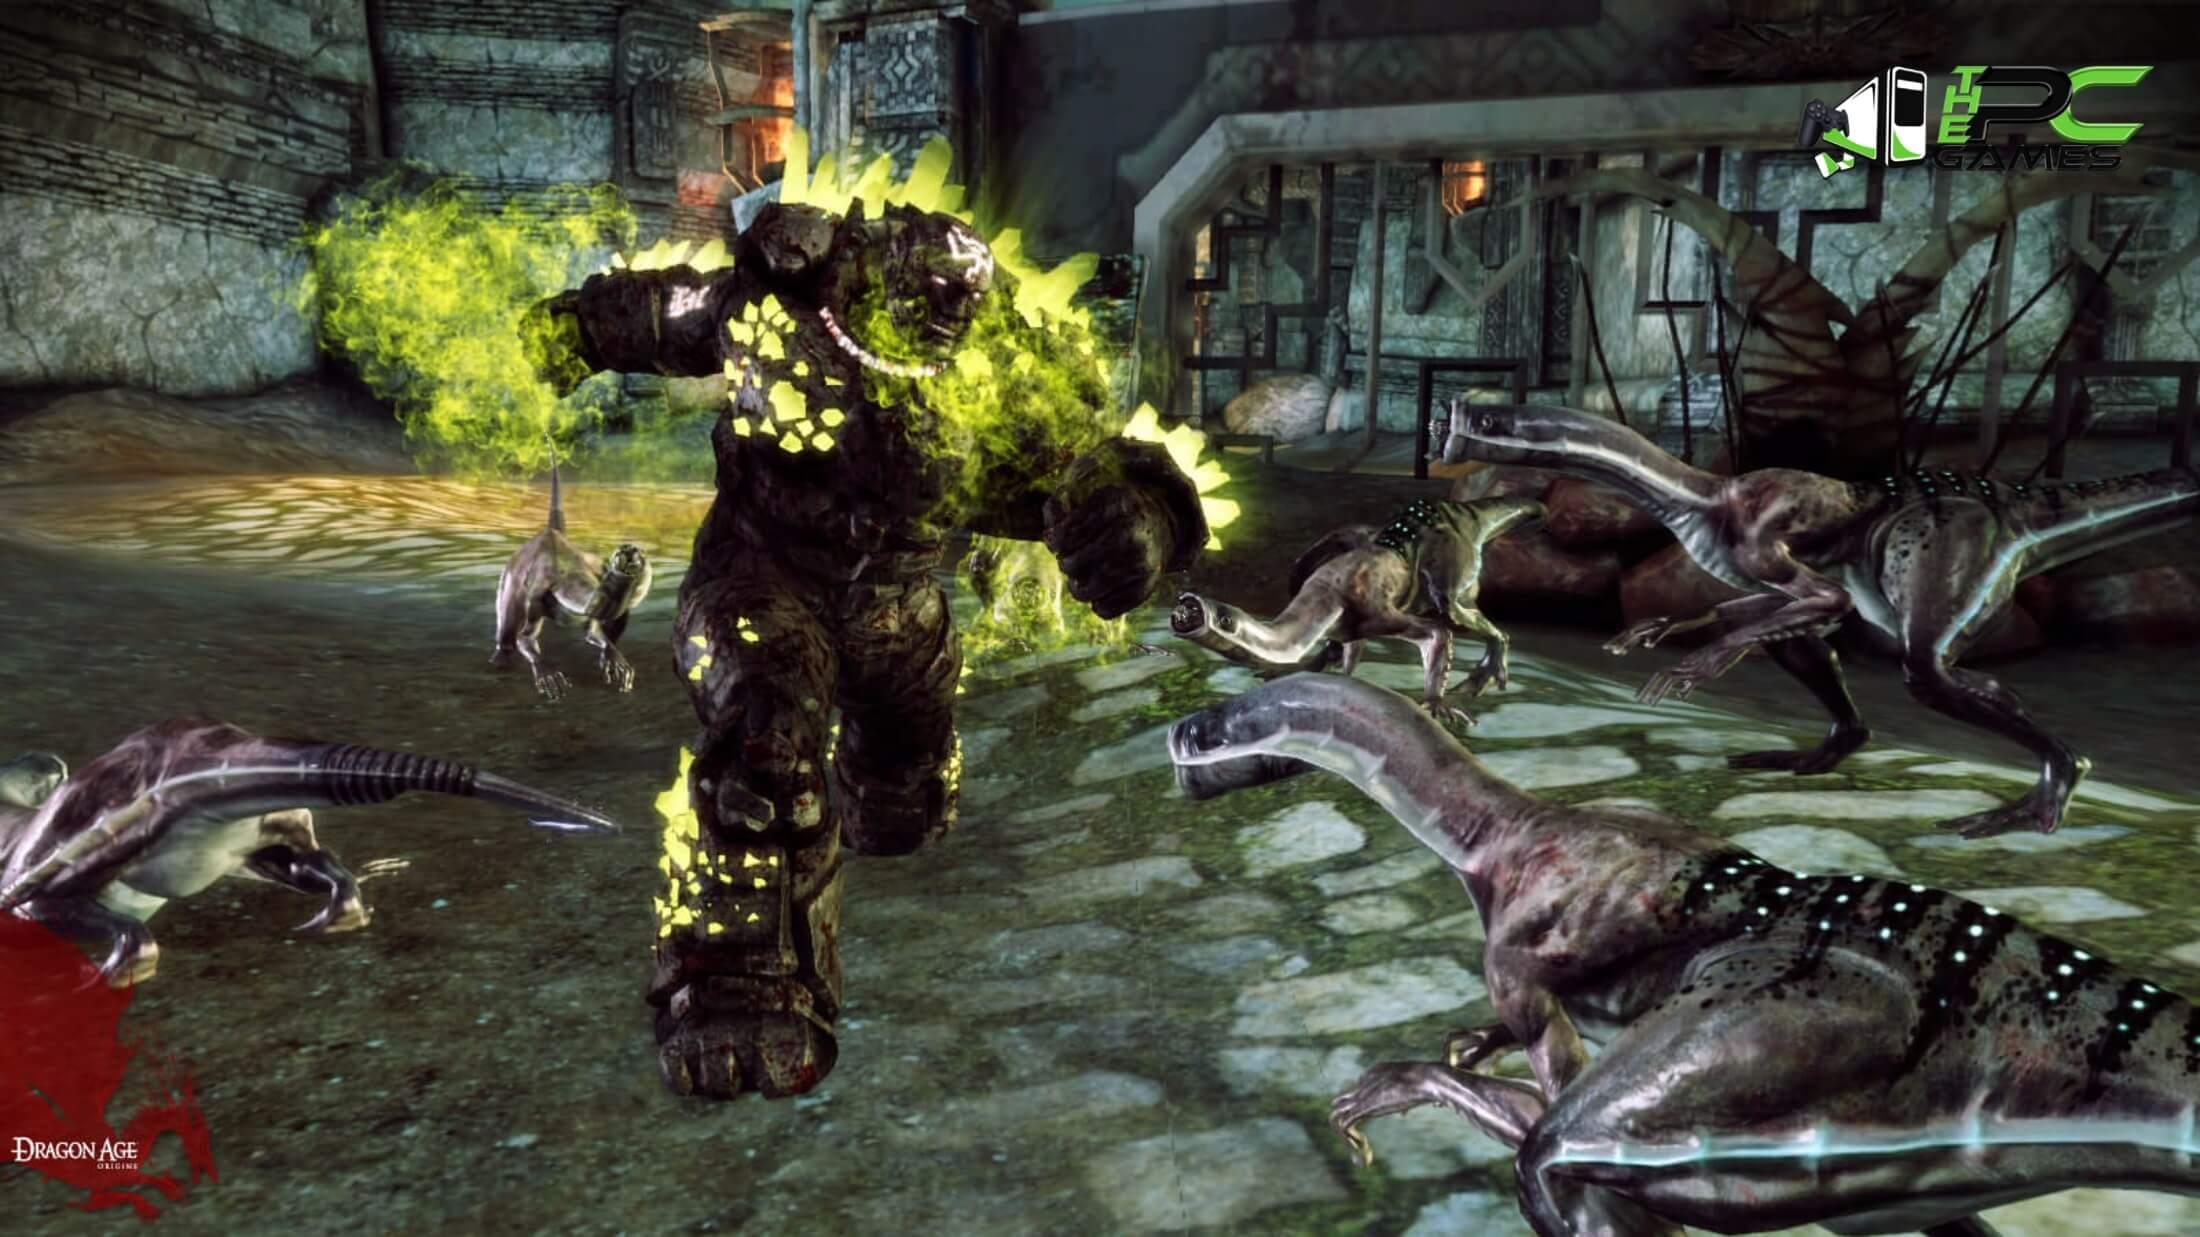 dragon age origins ultimate edition pc download